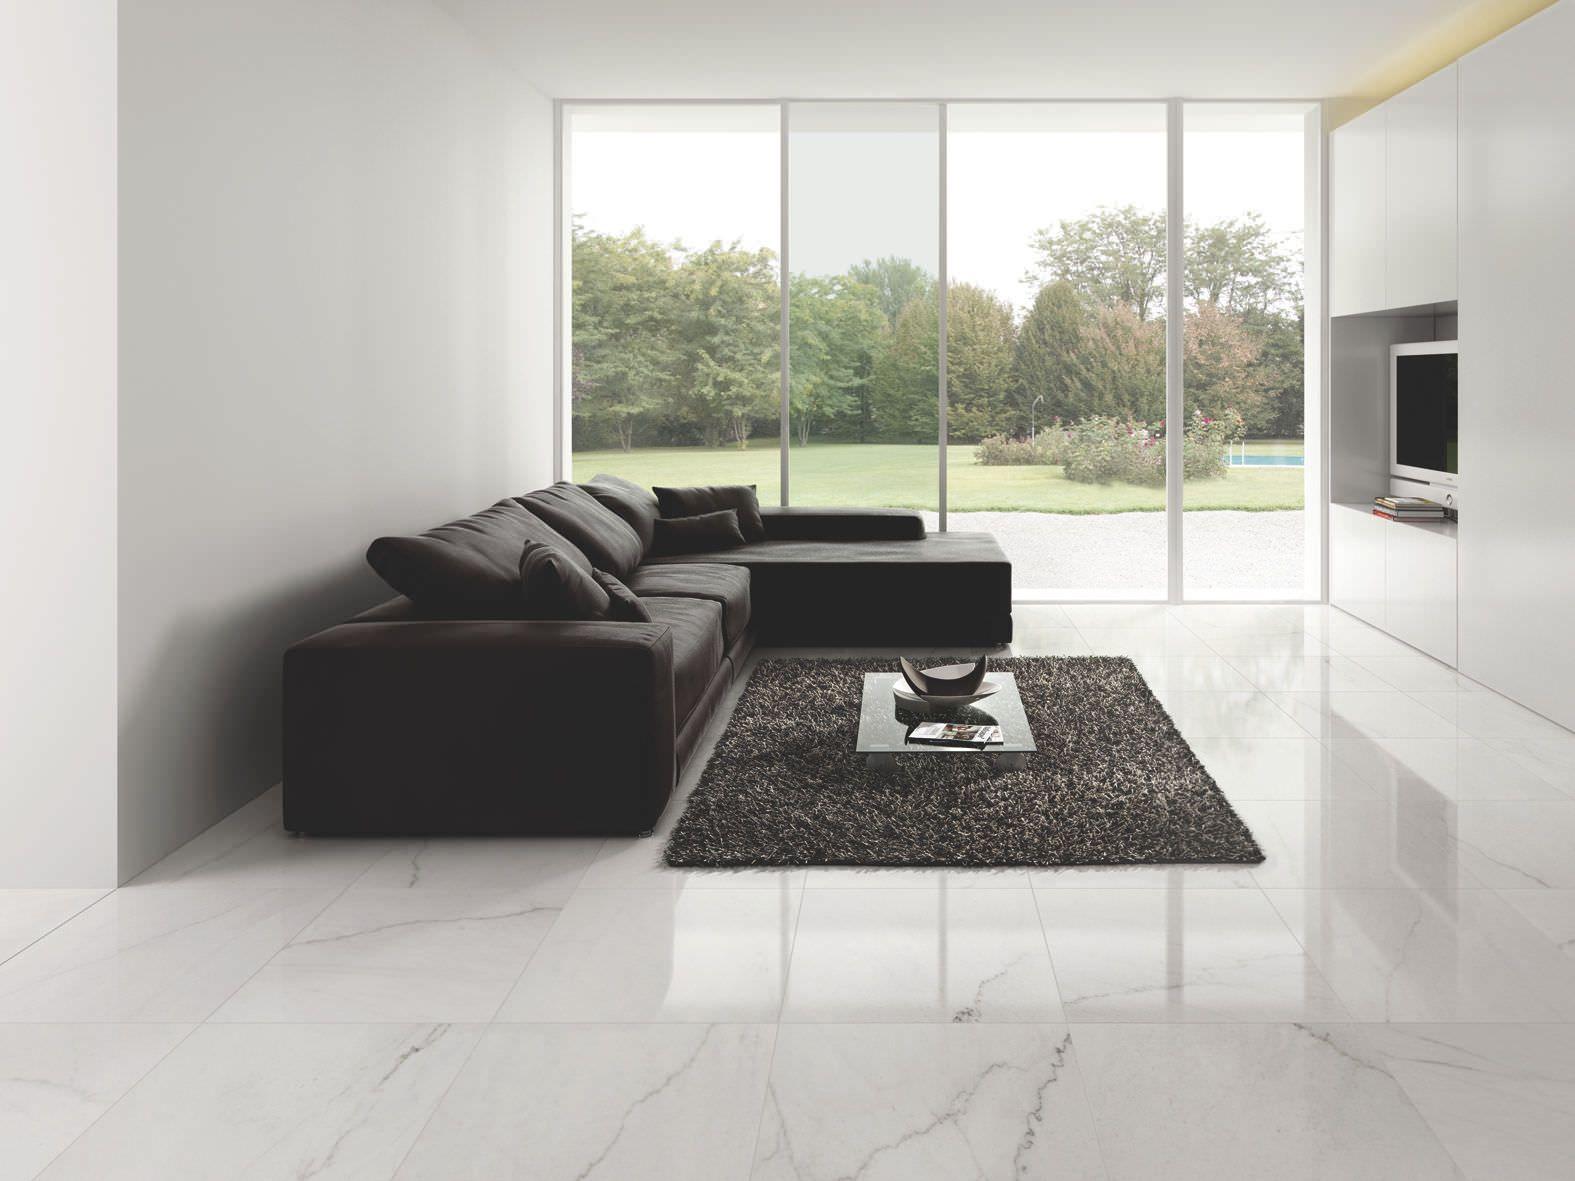 Interior Marble S Grout Lines In Porcelain Tiles Flooring Luxurious Black Rug Comfy Black Sofa Living Room Tiles Living Room Vinyl Flooring Living Room Vinyl